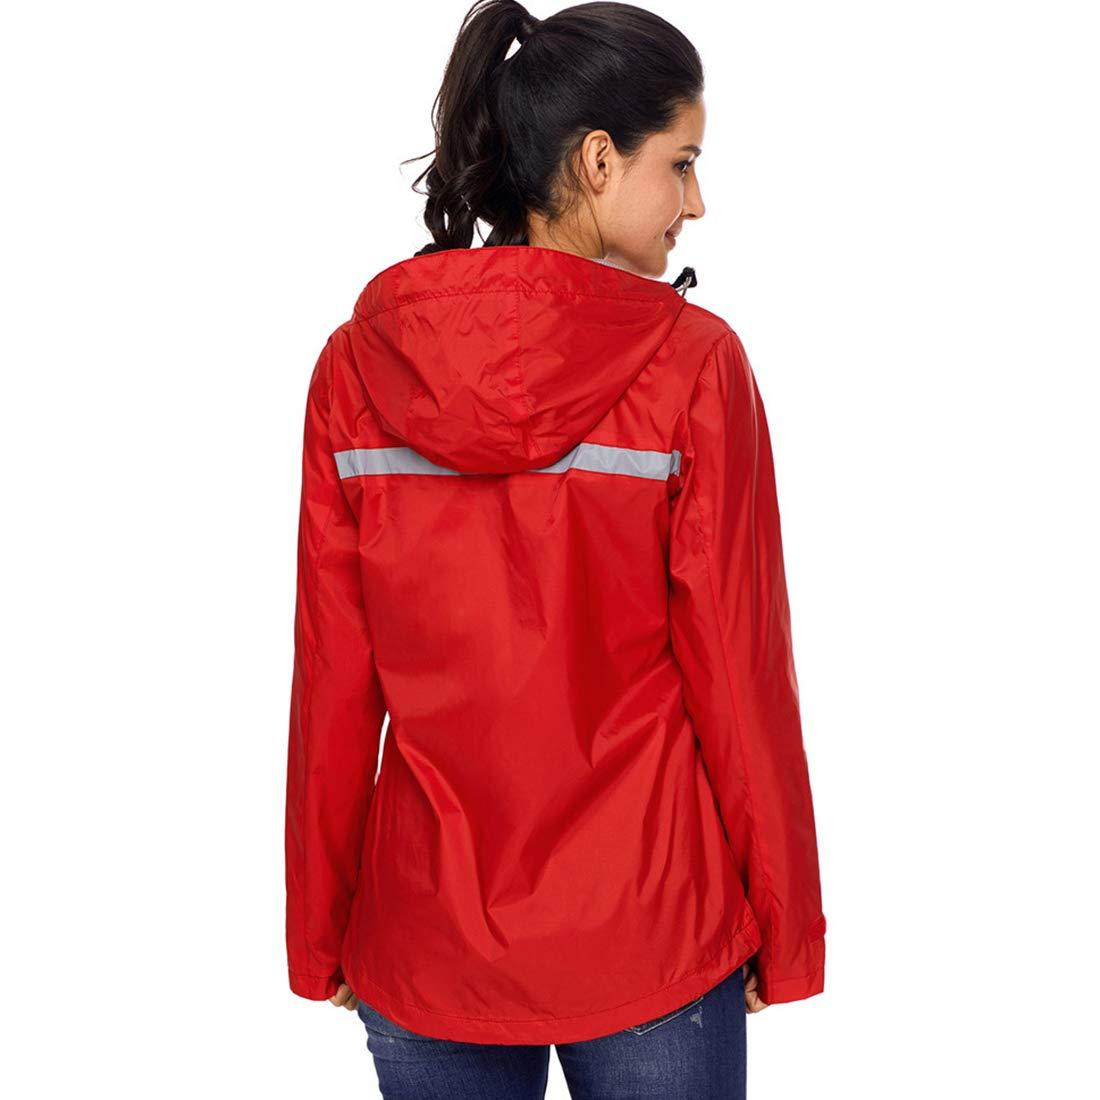 Alomoc Womens Waterproof Hooded Active Rain Jacket Mountaineering Windbreaker with Hood